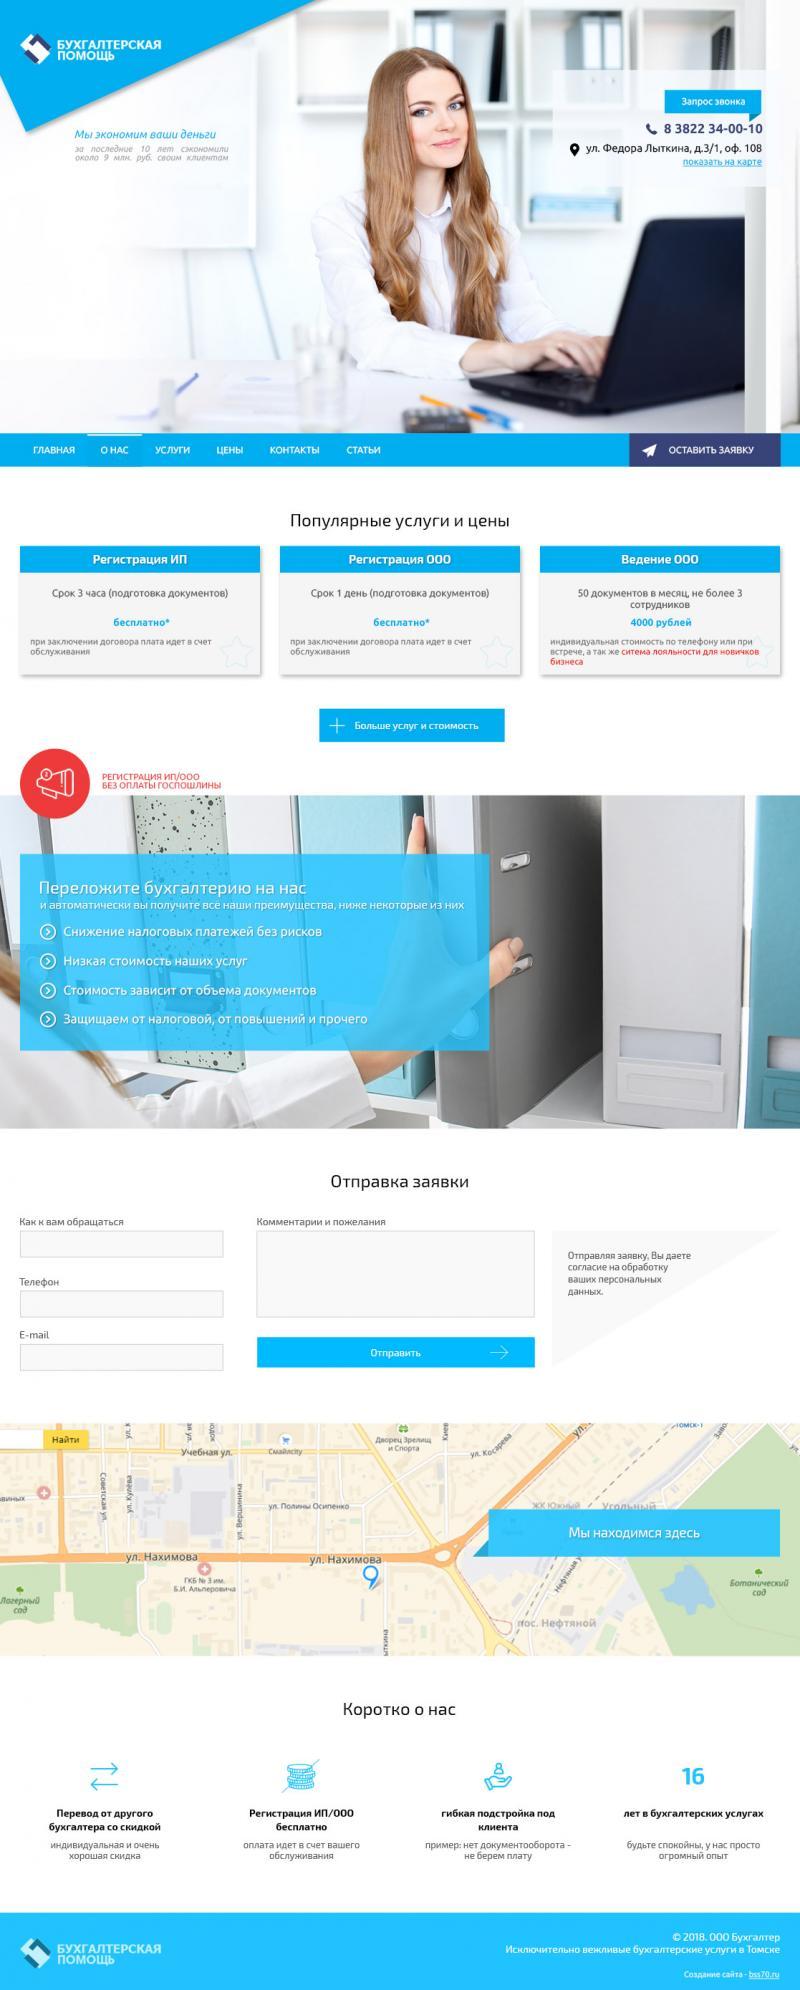 Бухгалтер в Томске (сайт)